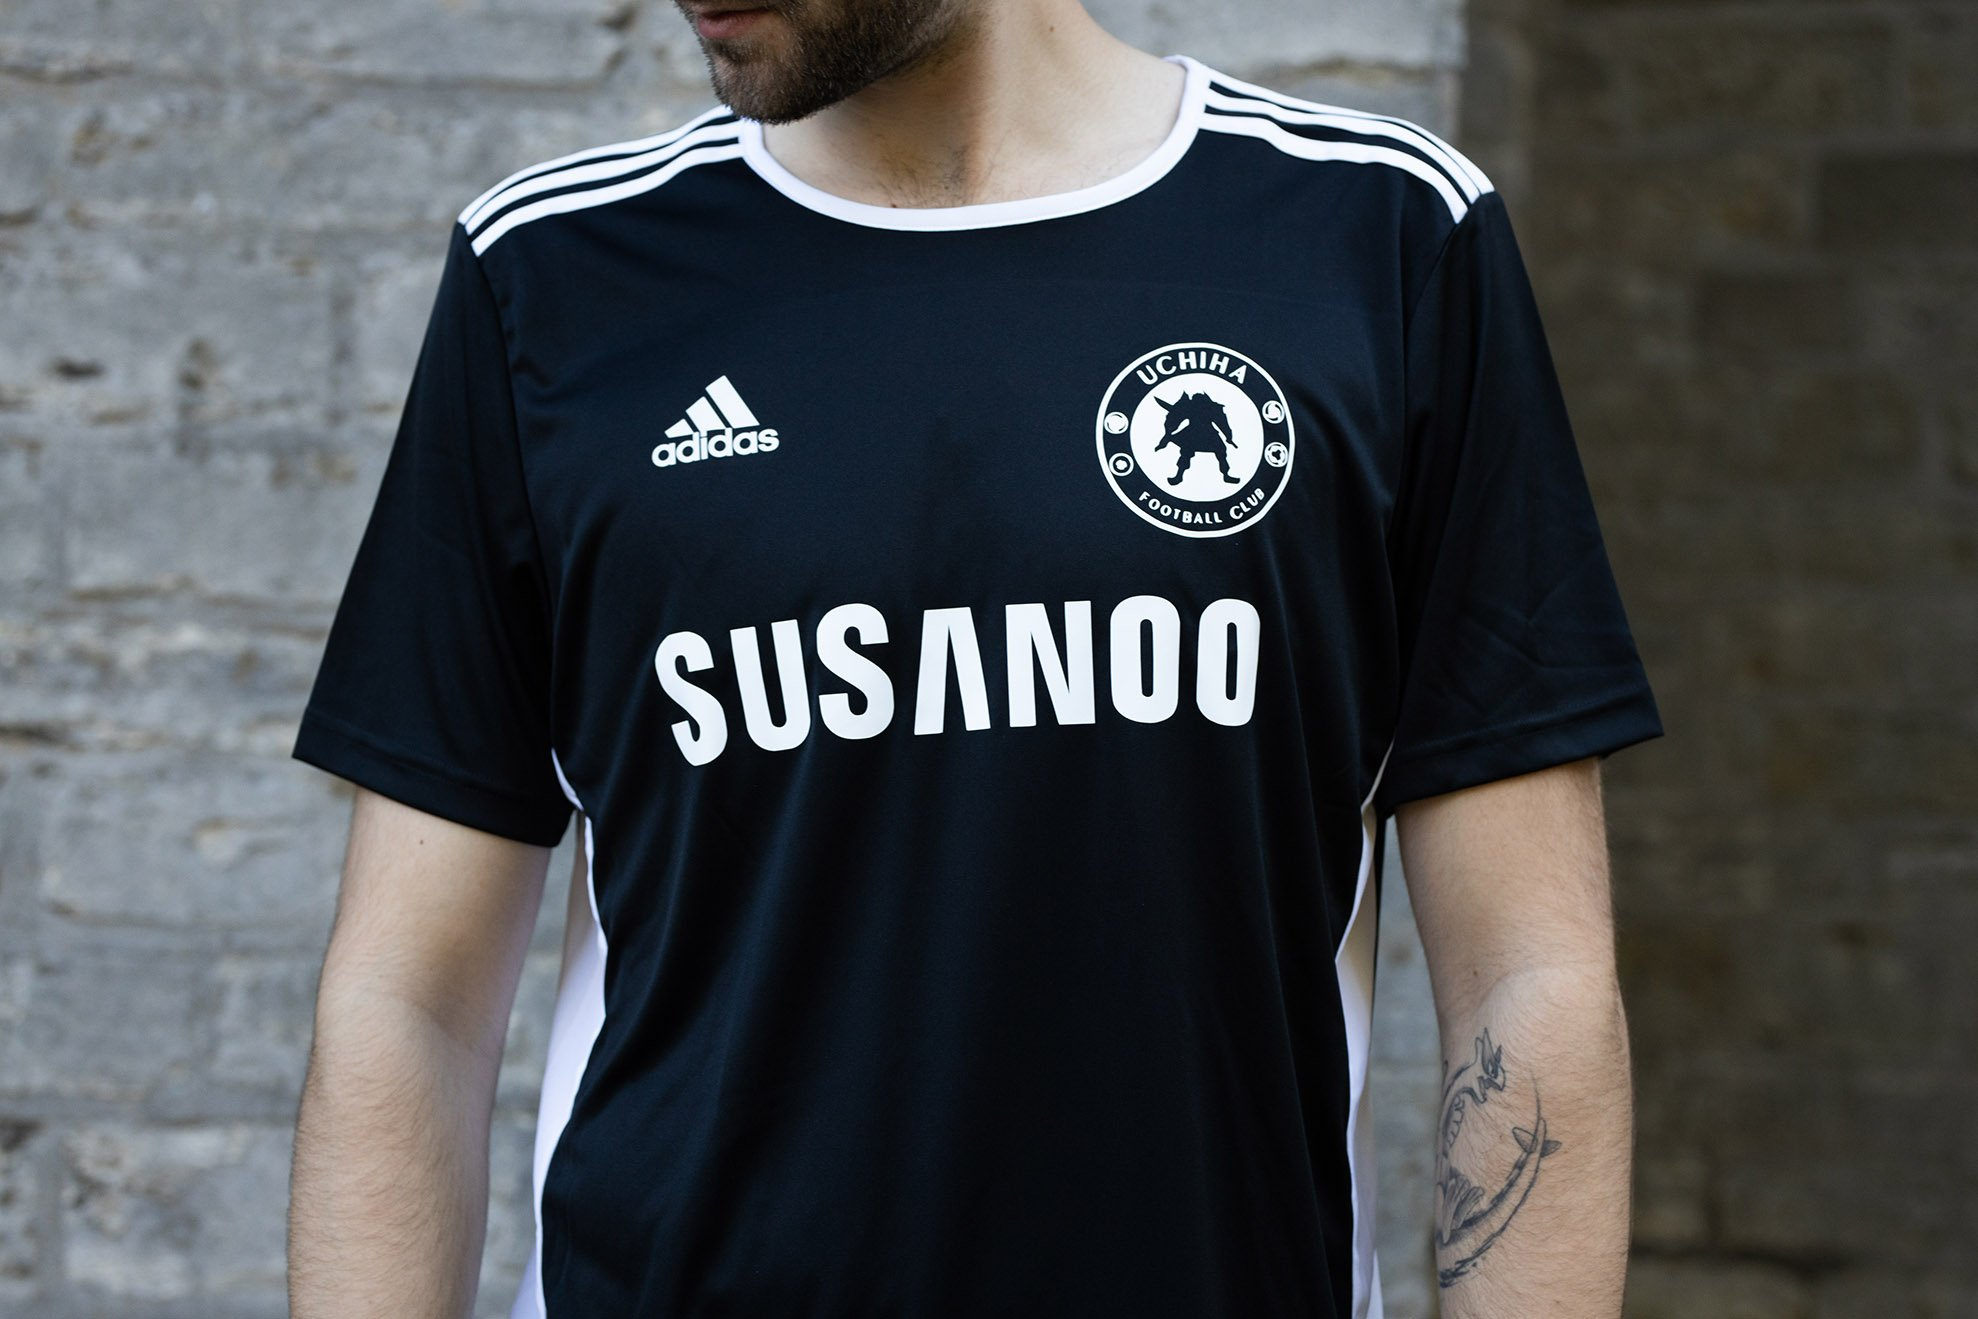 Susanoo Adidas jersey